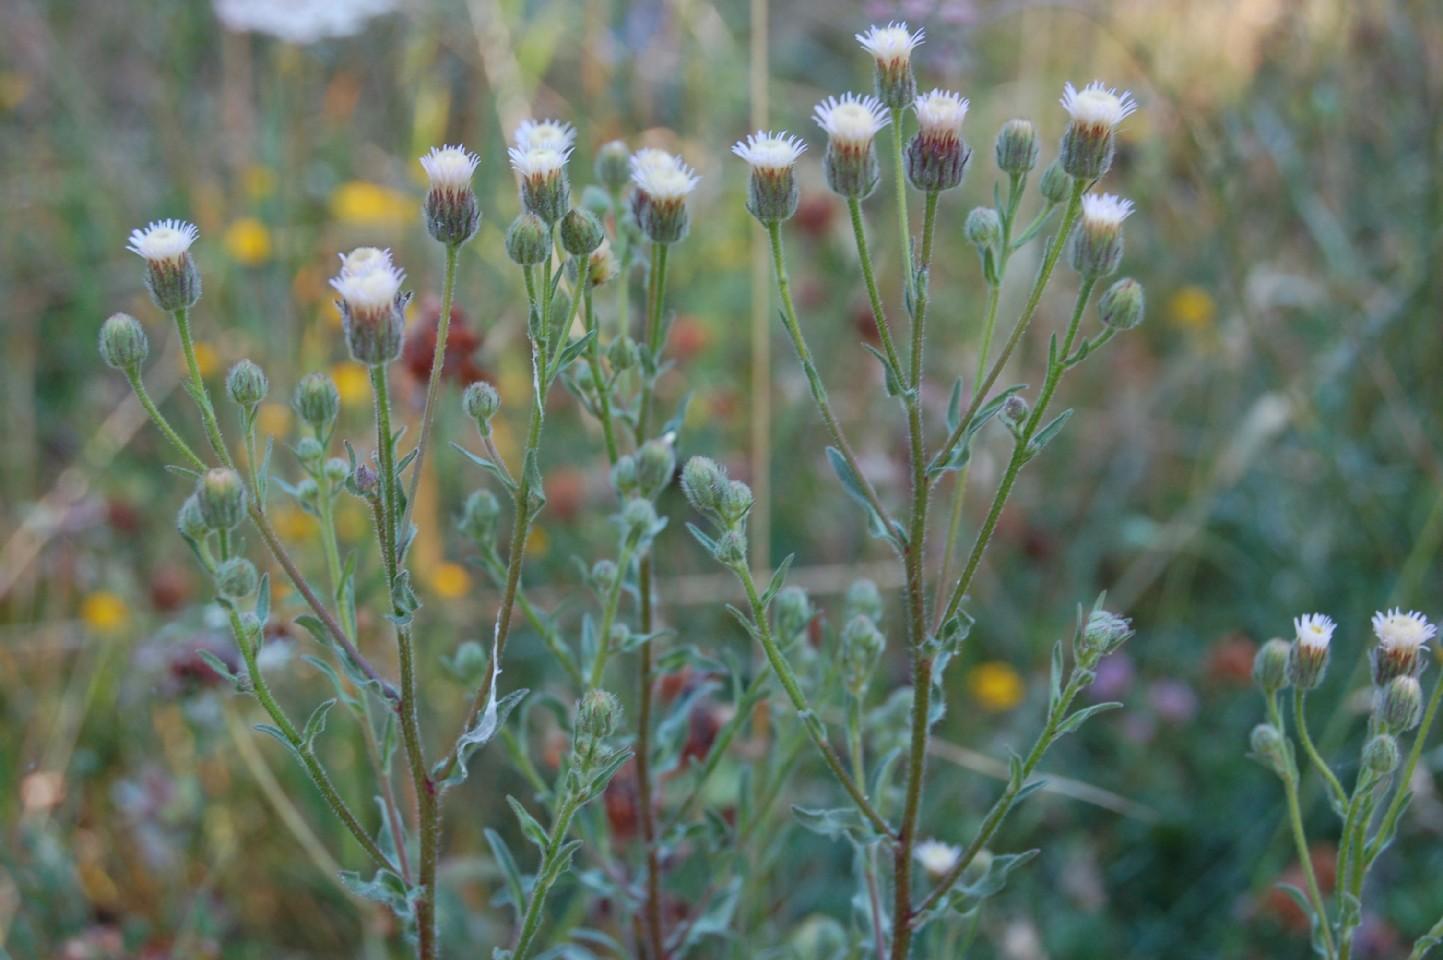 Erigeron acer subsp. acer